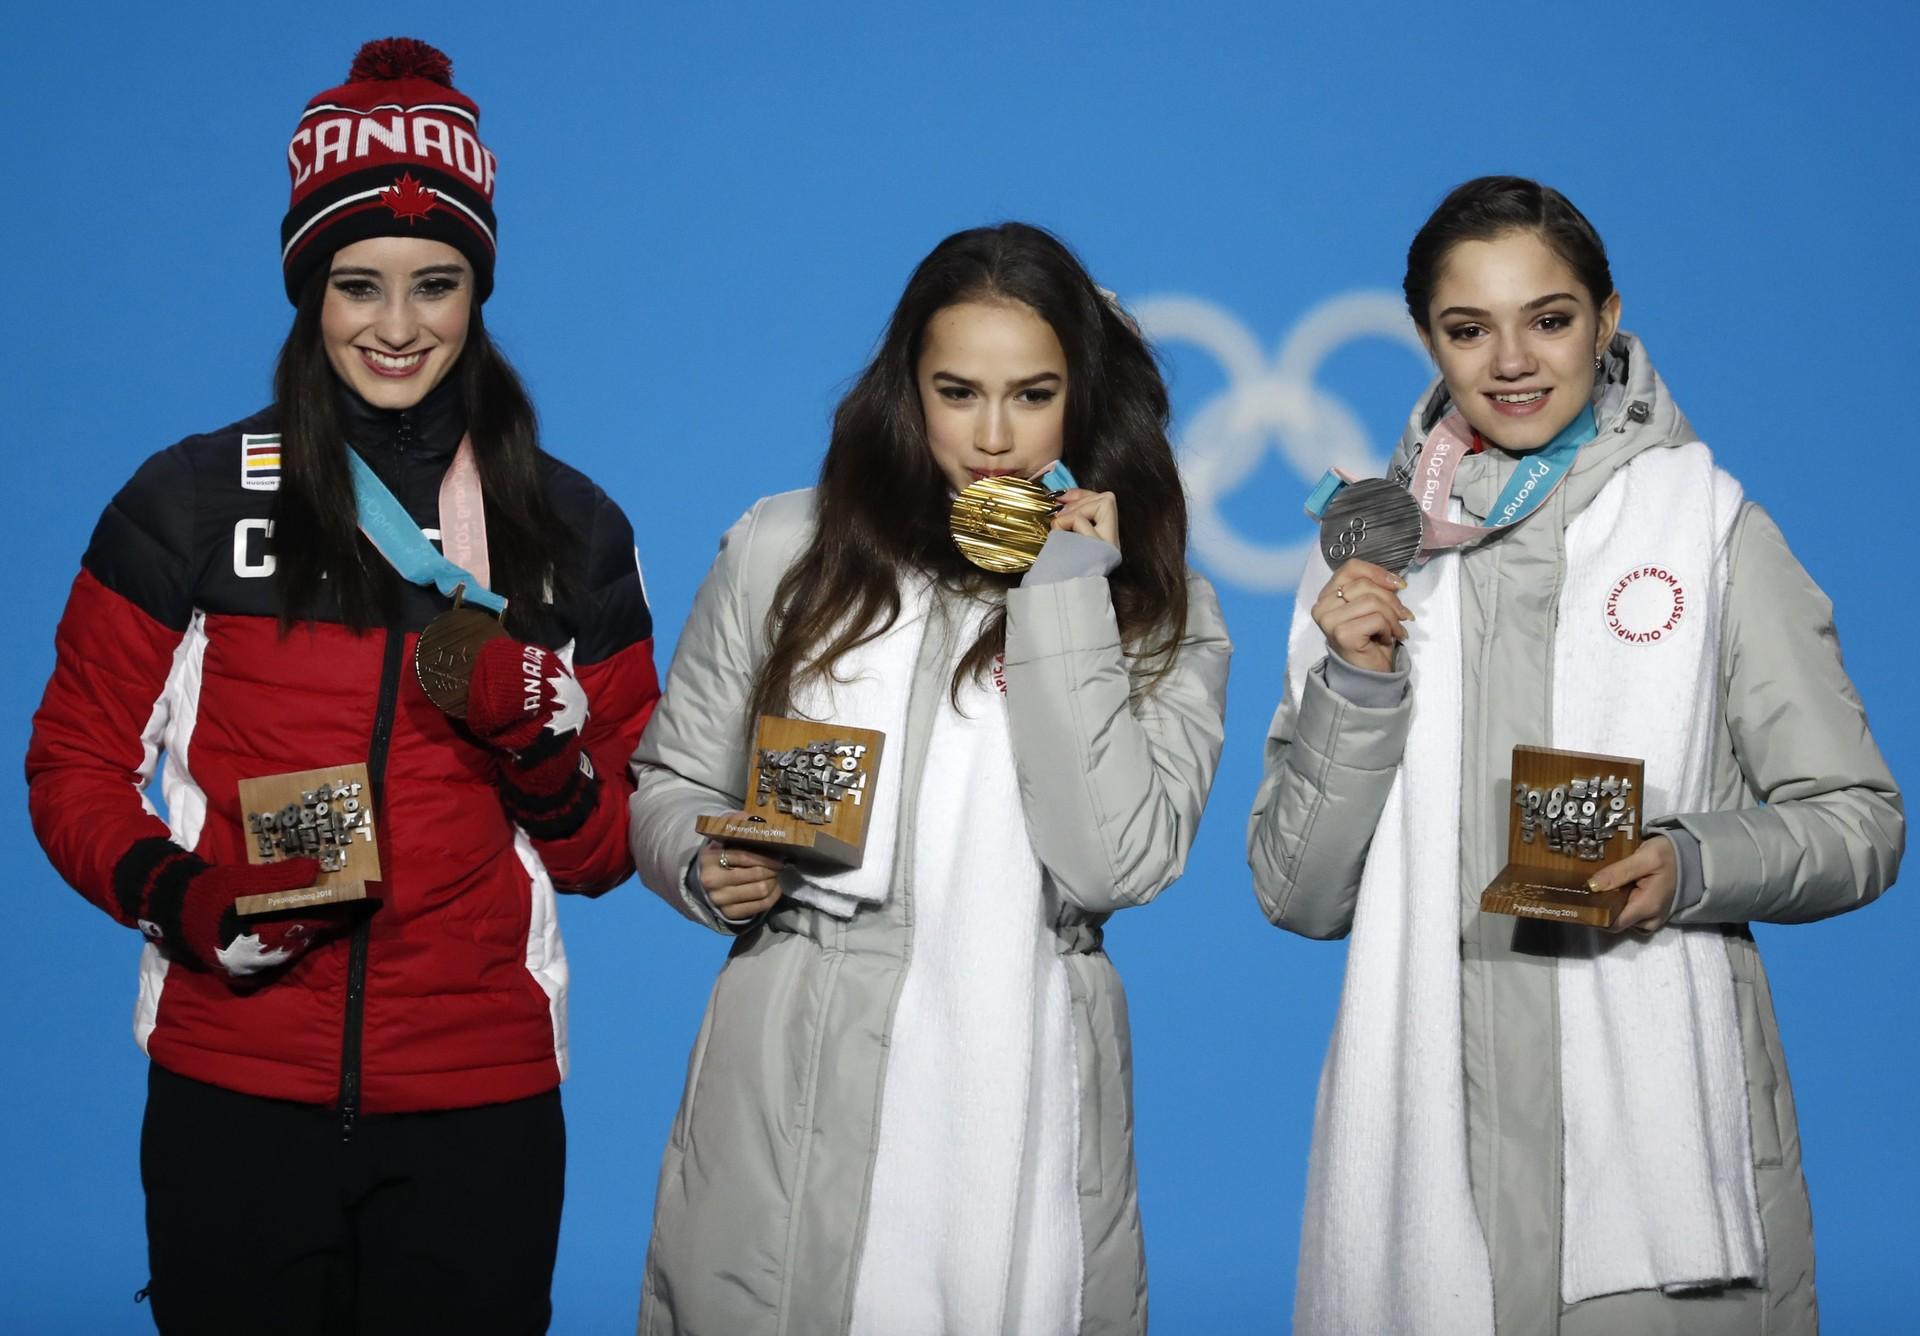 Sur la photo, Alina Zagitova, Evgenia Medvedeva et la Canadienne Kaetlyn Osmond, ce trio qui a occipé les trois marches du podium.